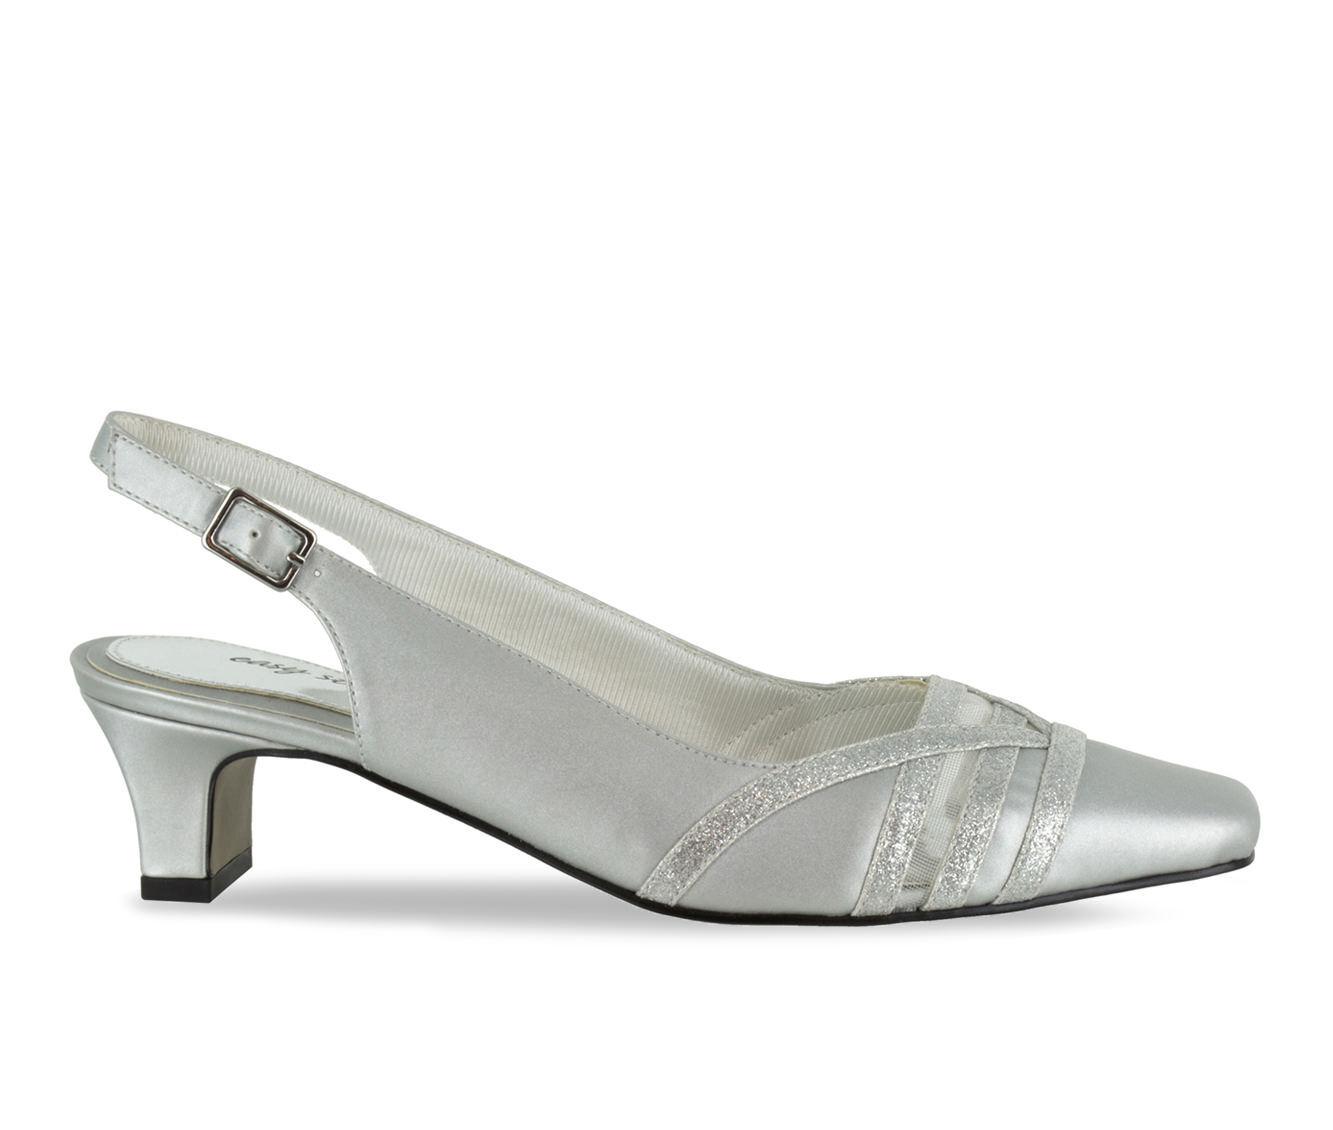 latest style Women's Easy Street Kristen Shoes Silver Satin